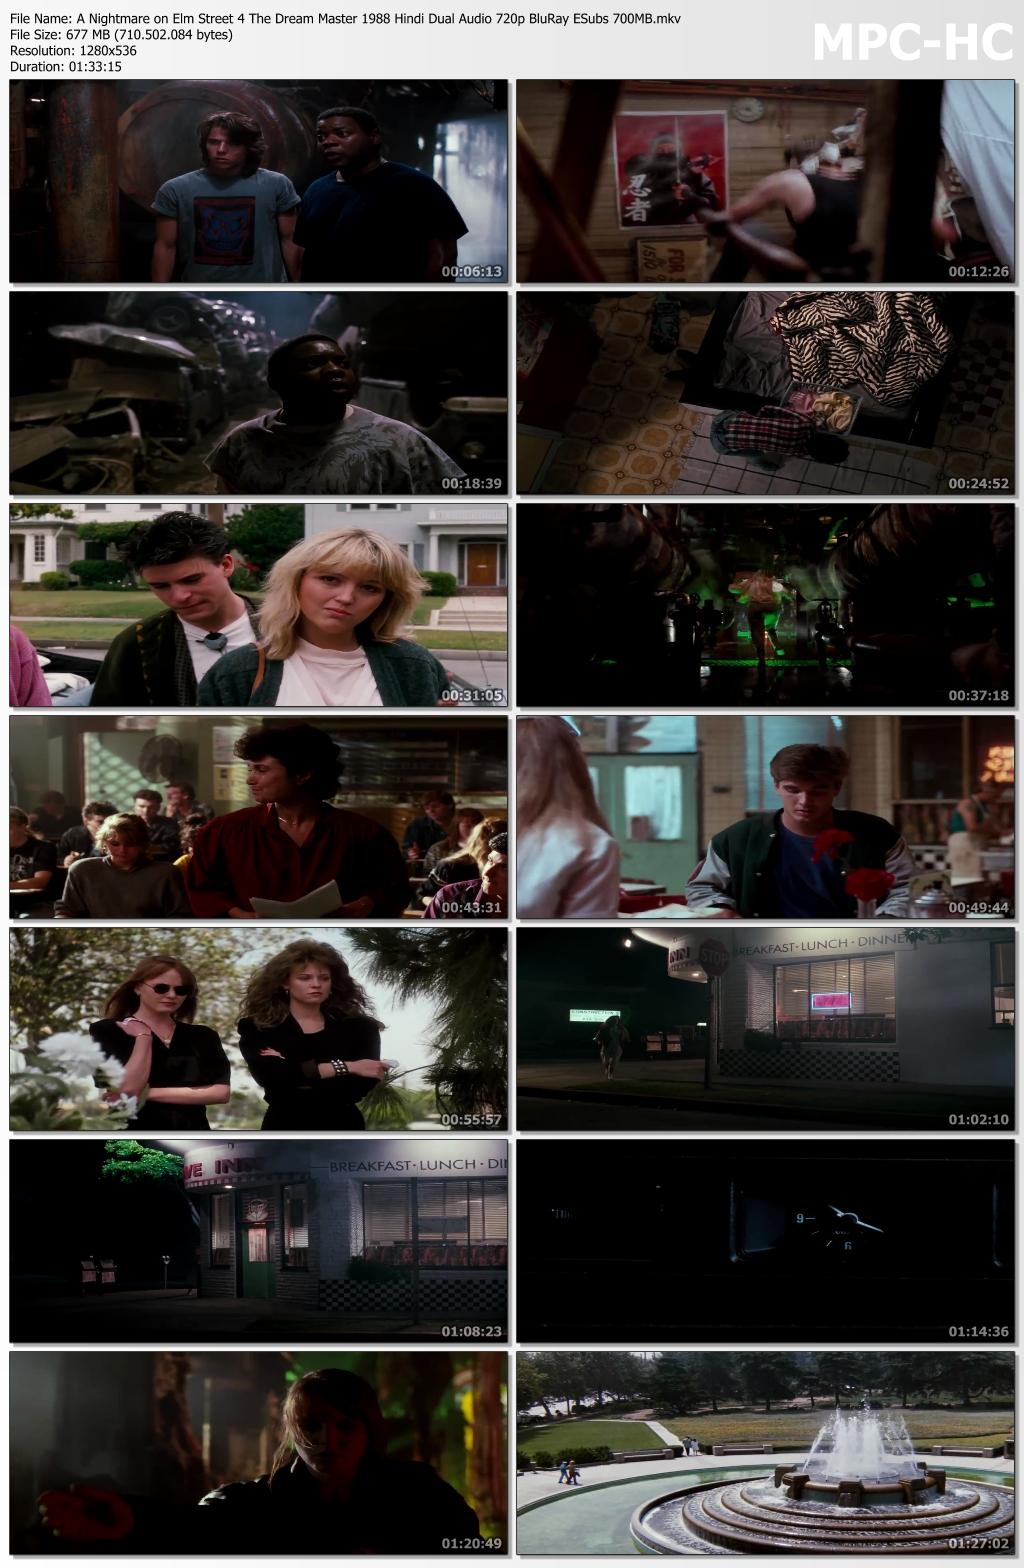 A-Nightmare-on-Elm-Street-4-The-Dream-Master-1988-Hindi-Dual-Audio-720p-Blu-Ray-ESubs-700-MB-mkv-thu